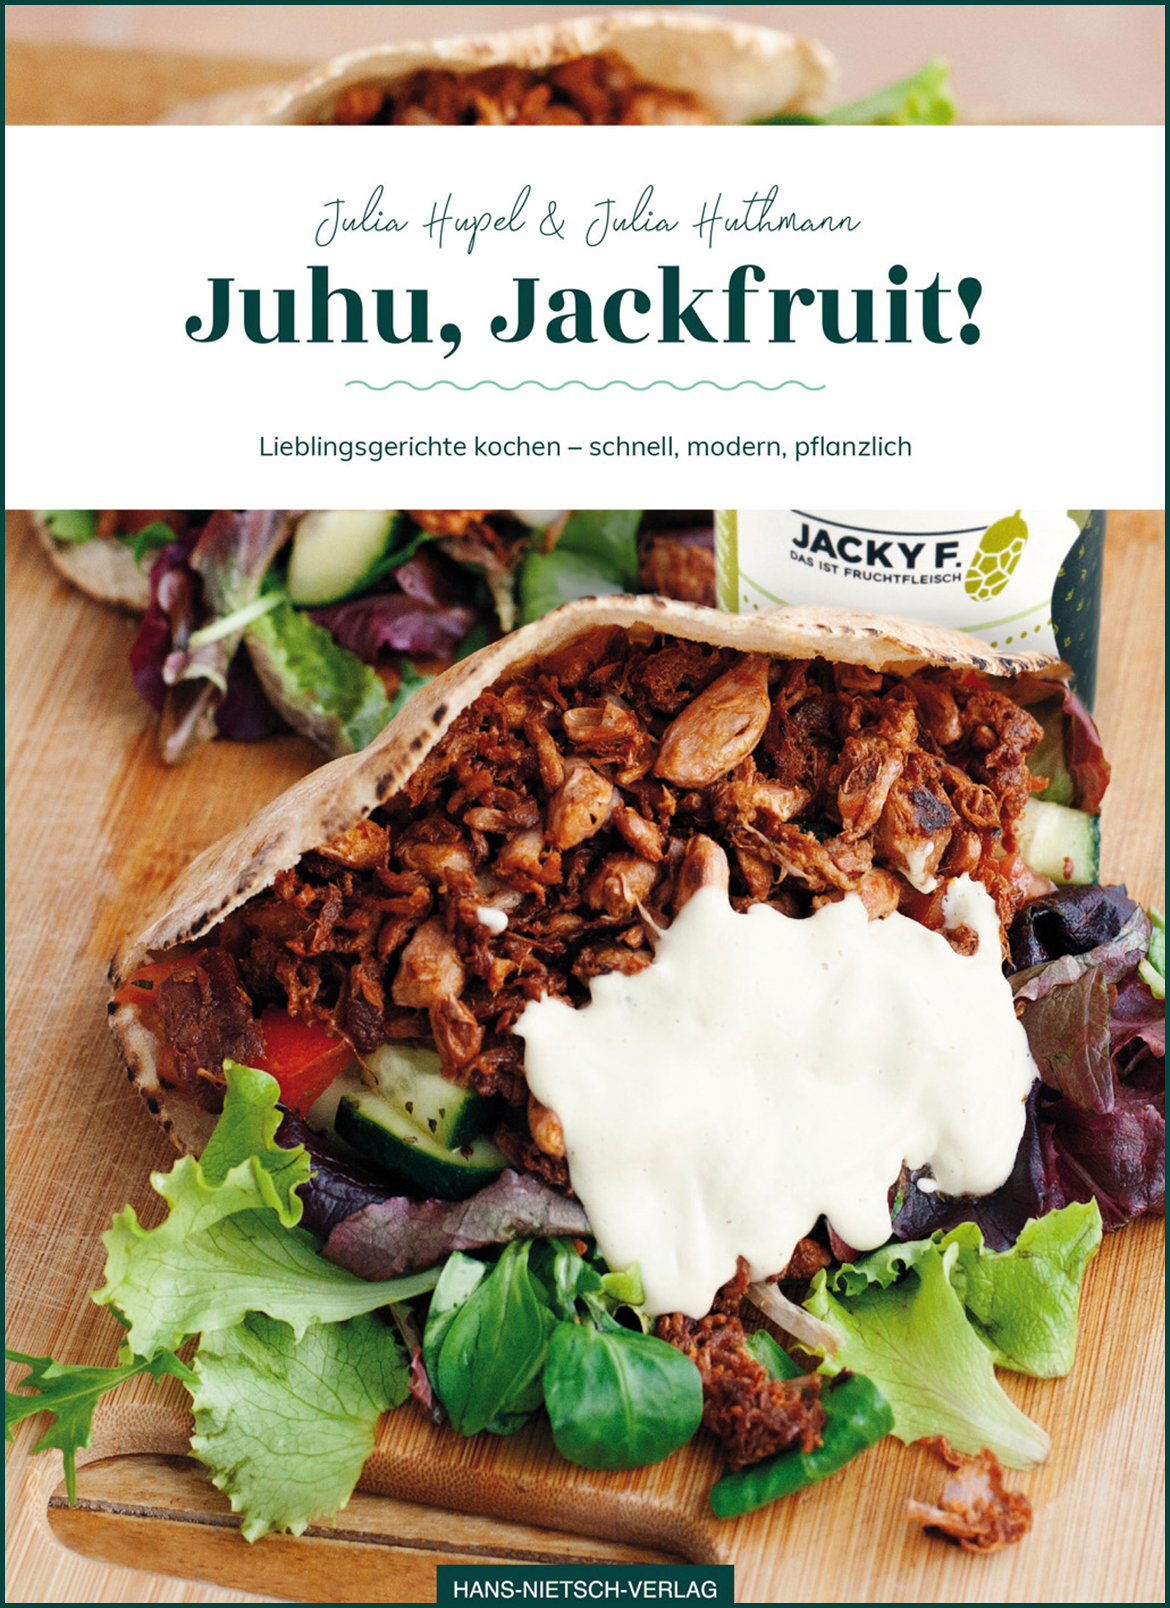 Juhu, Jackfruit! Lieblingsgerichte kochen – schnell, modern, pflanzlich